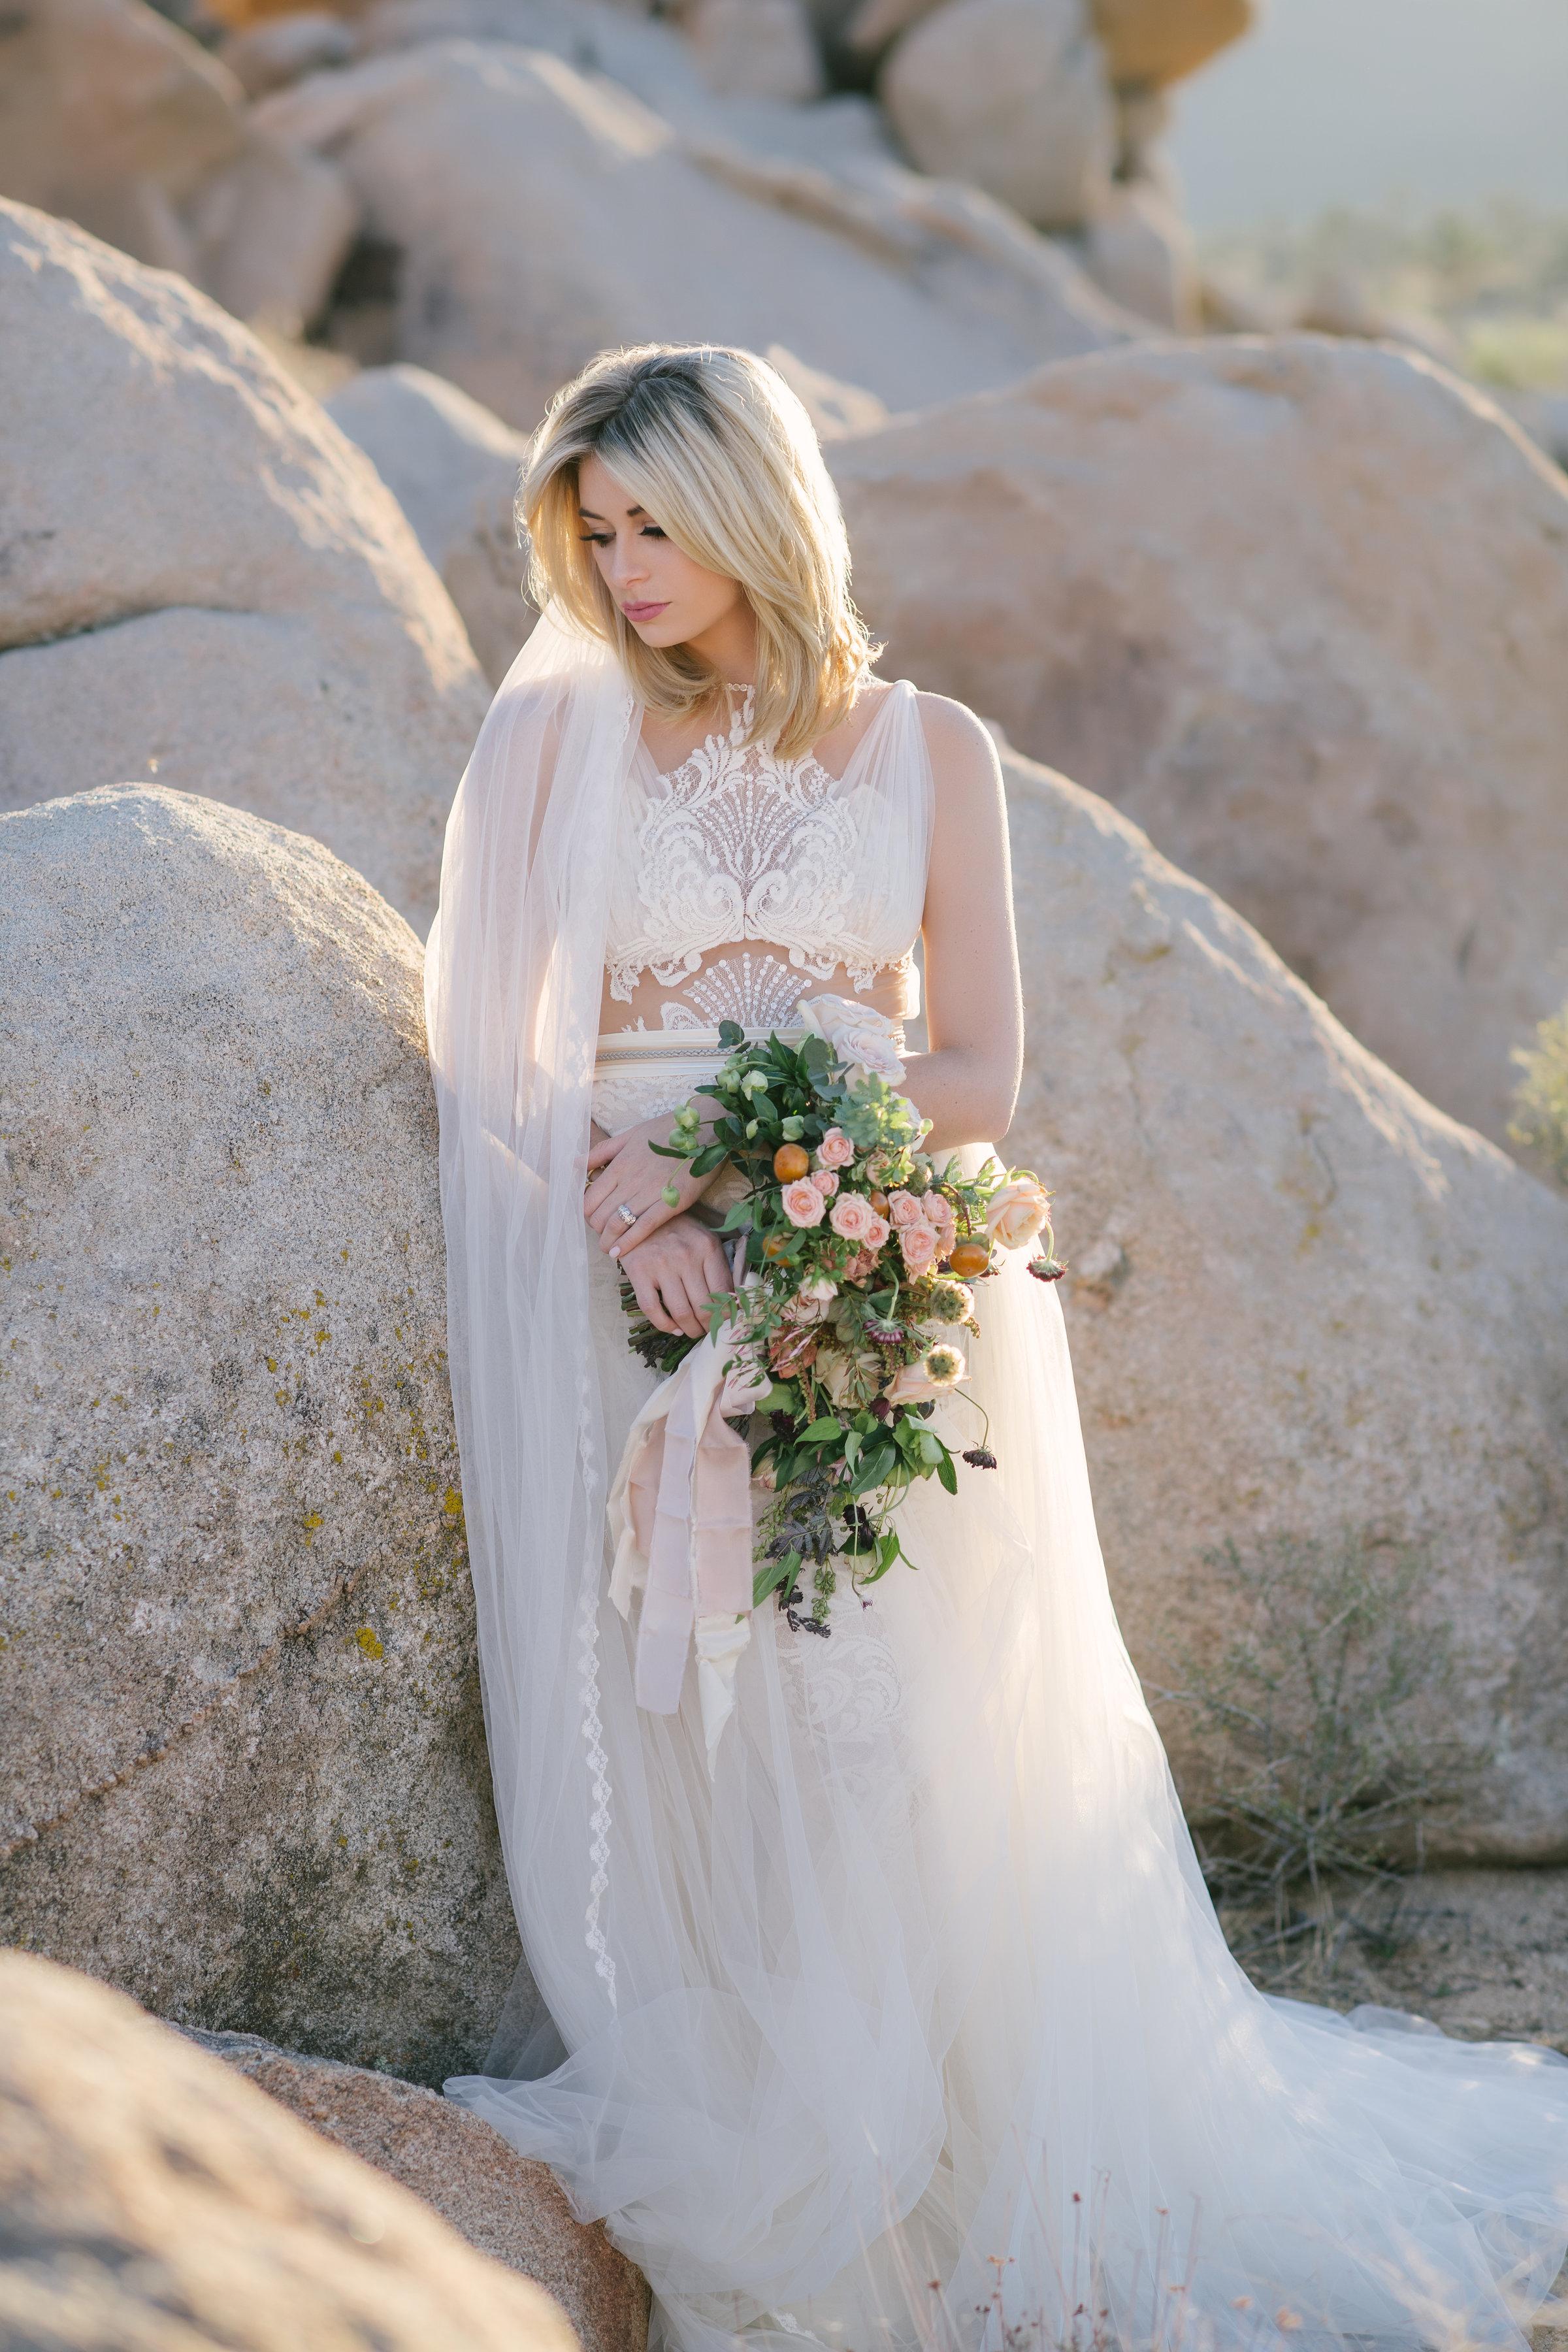 jessica-zimmerman-events-floral-event-design-flowers-florist-bridal-portraits-joshua-tree-california-desert-pictures-organic-bouquet-whitney-bower-sydnie-ross